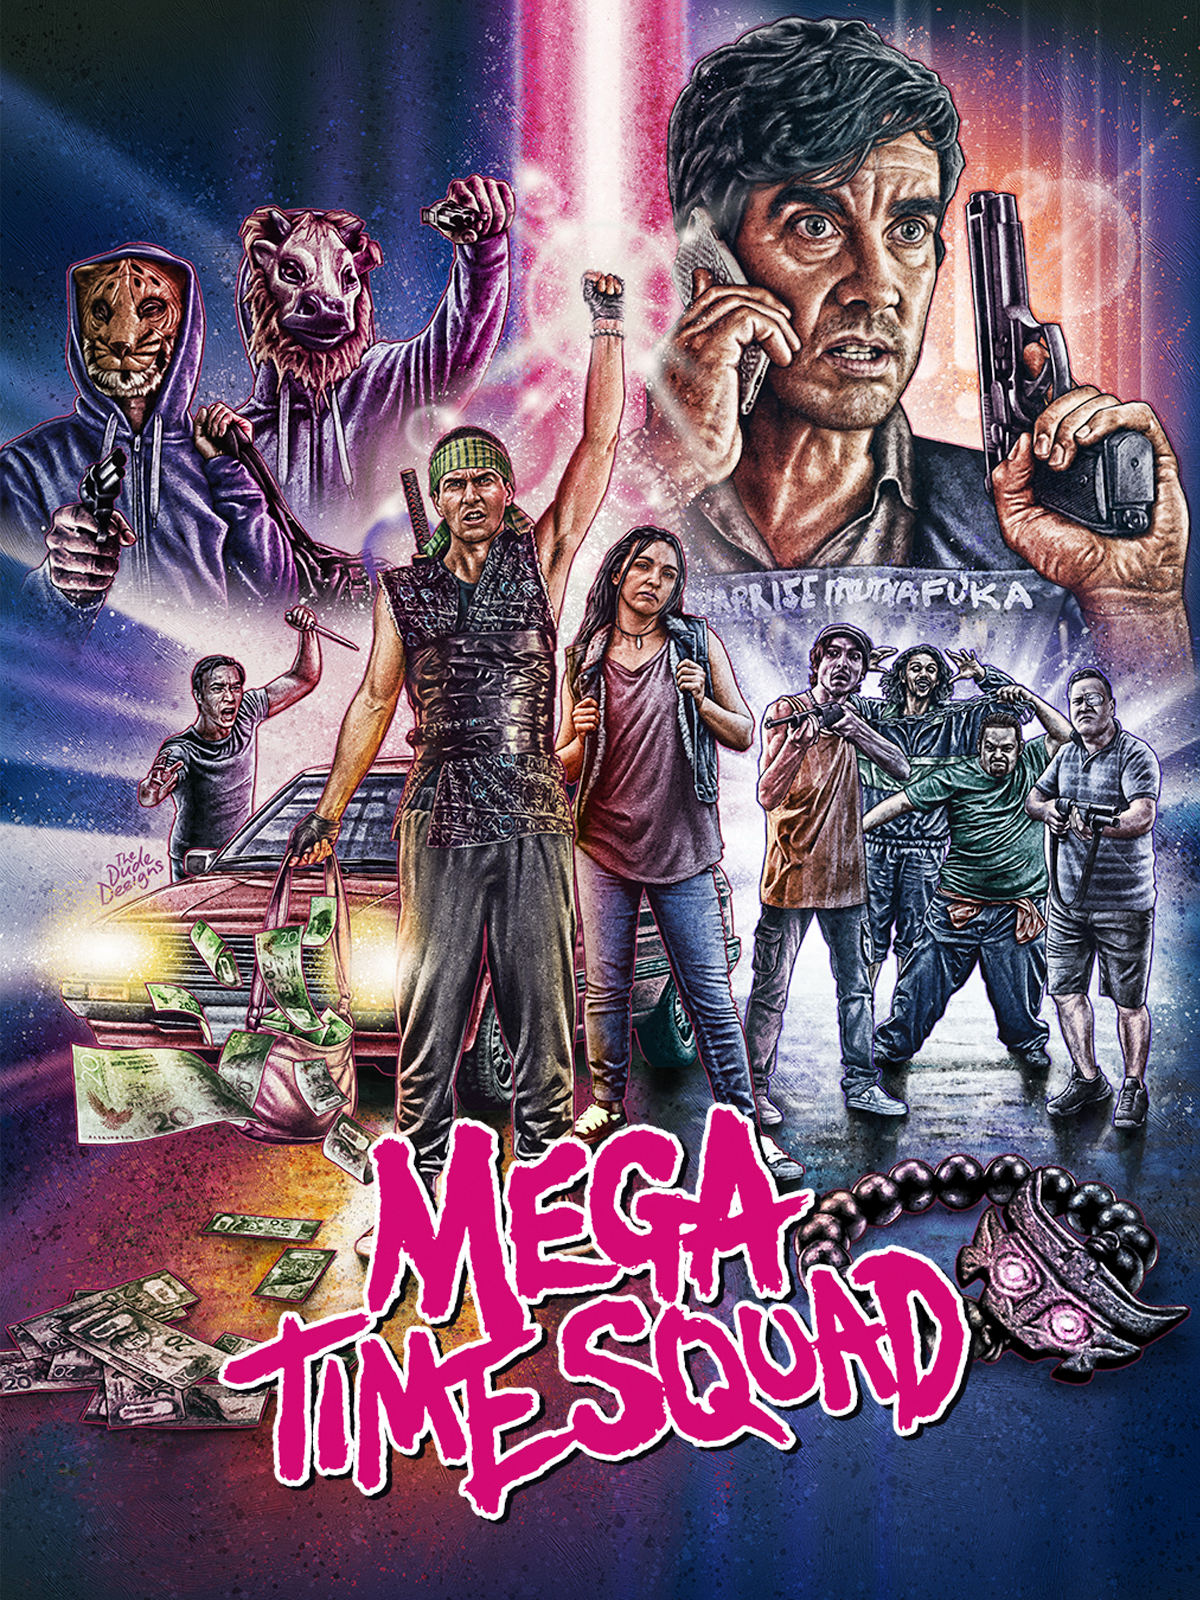 Mega Time Squad   van Dammen, Tim (Réalisateur)